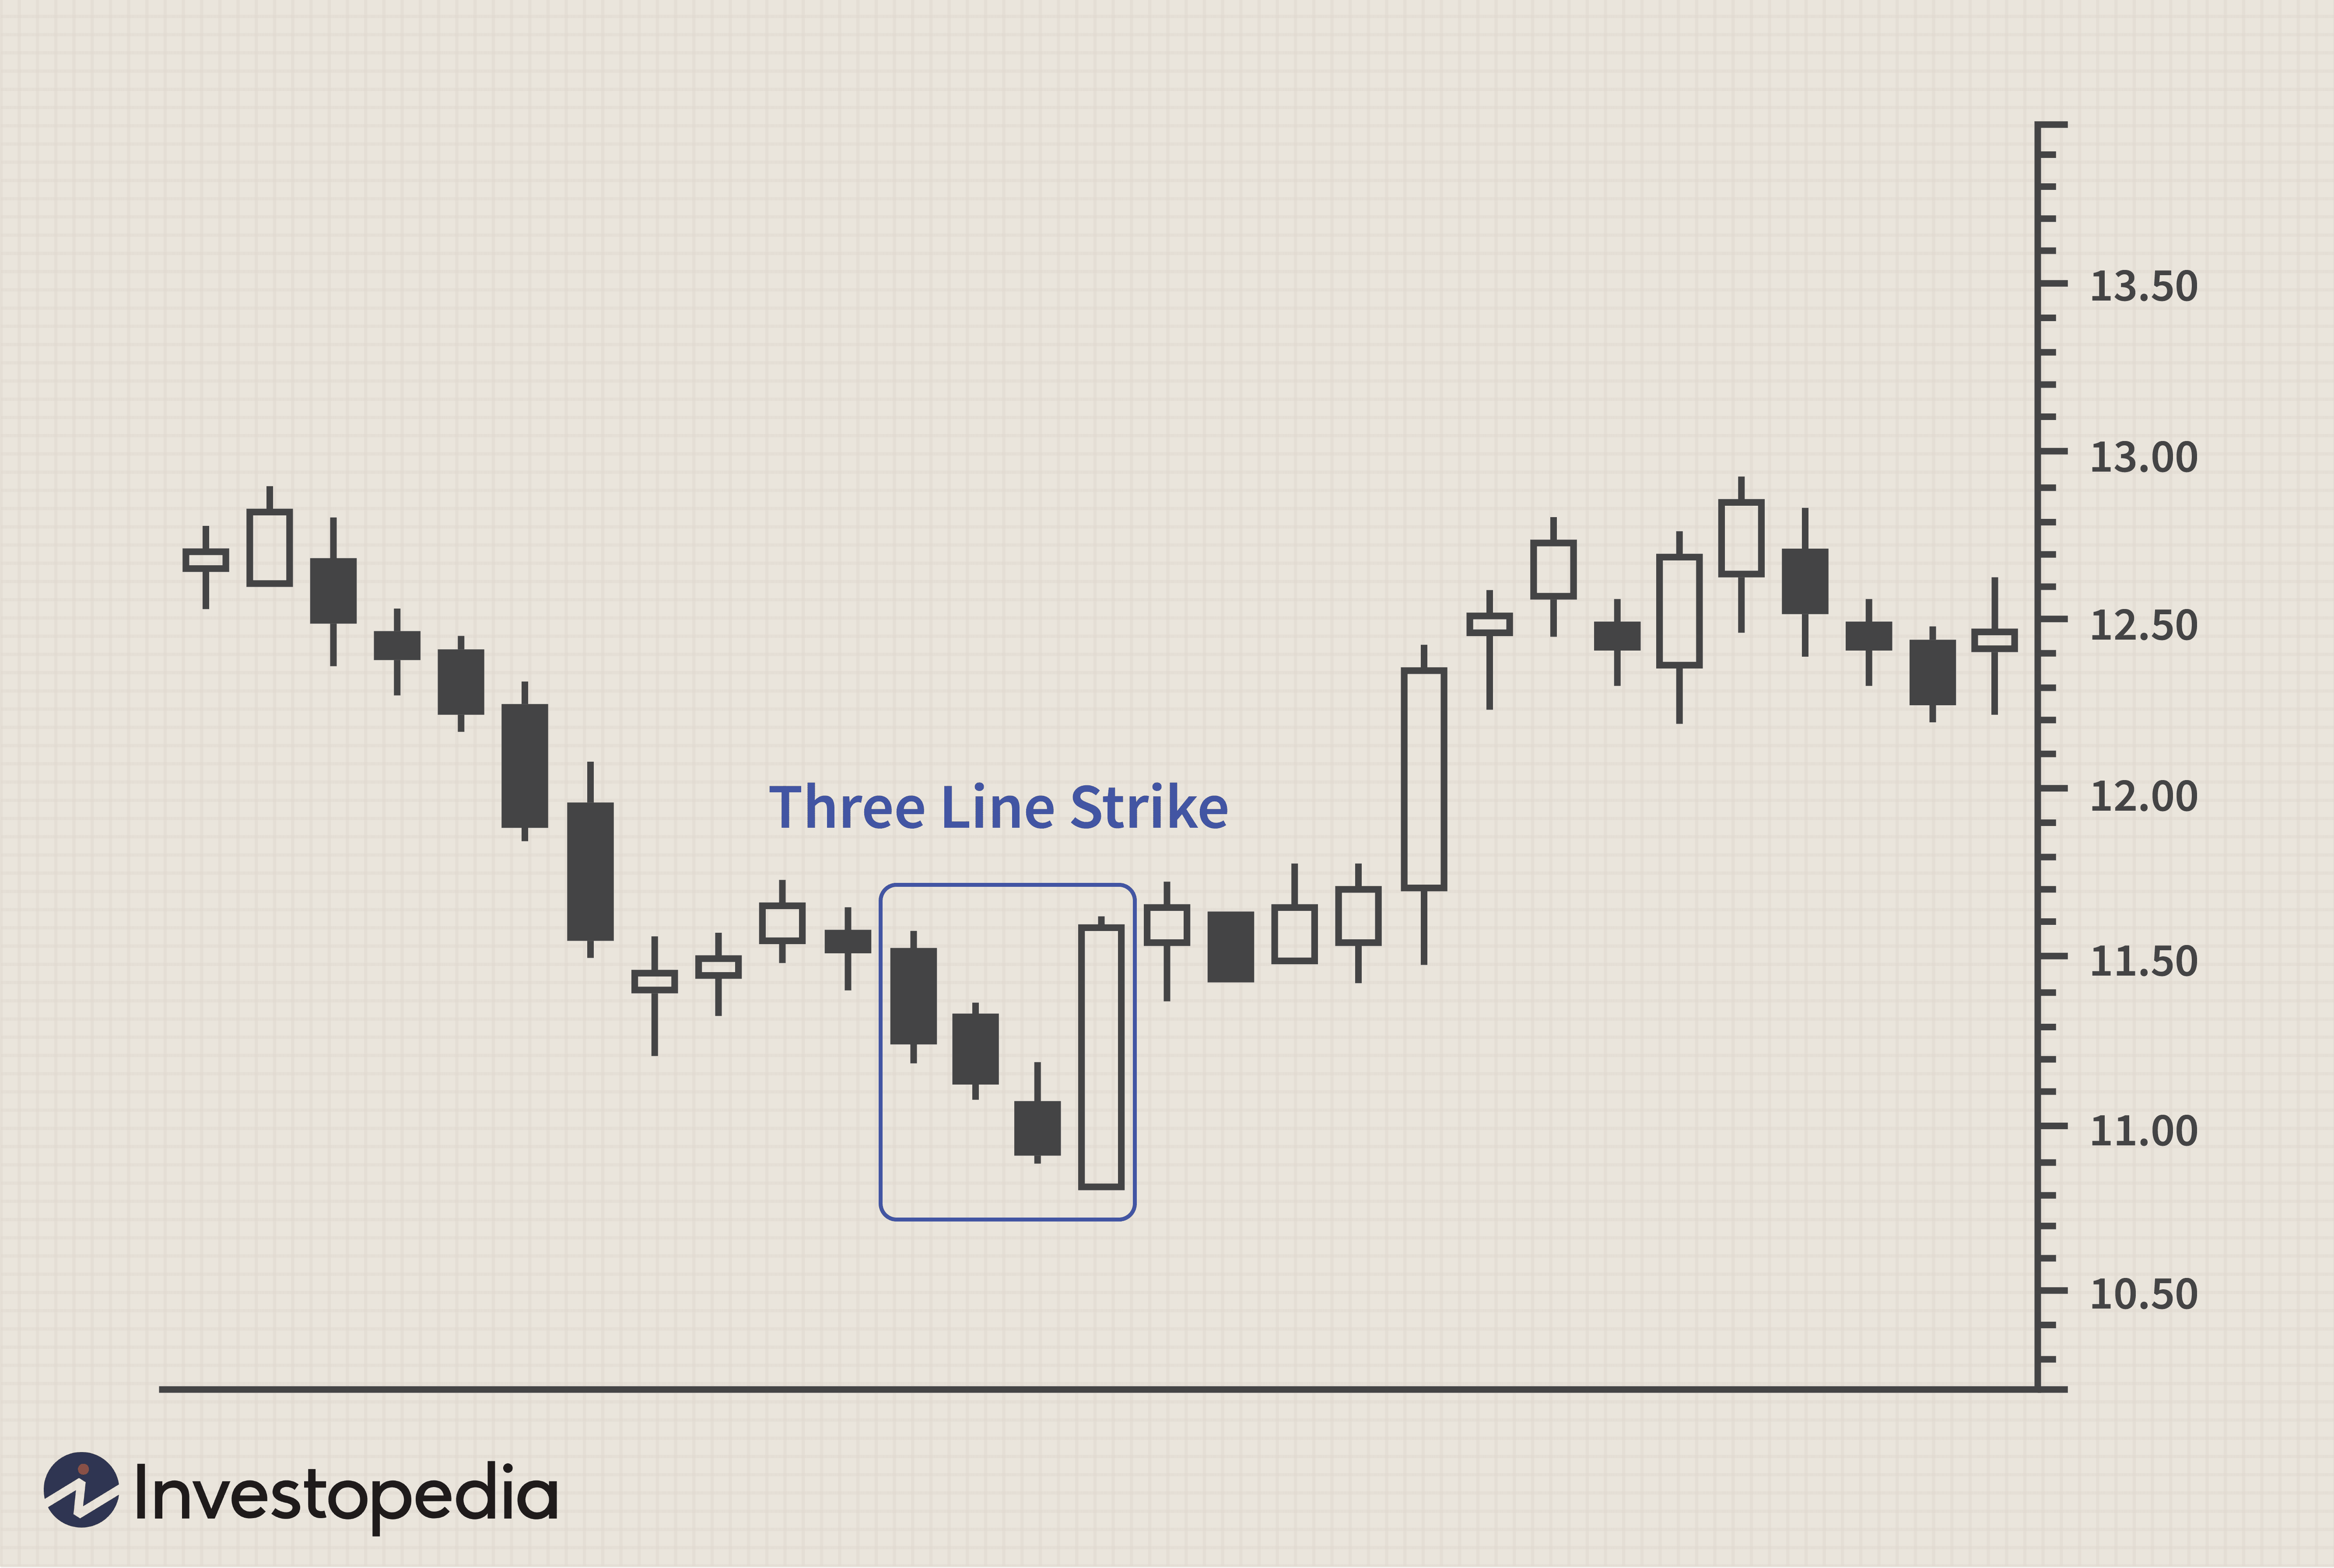 Three Line Strike